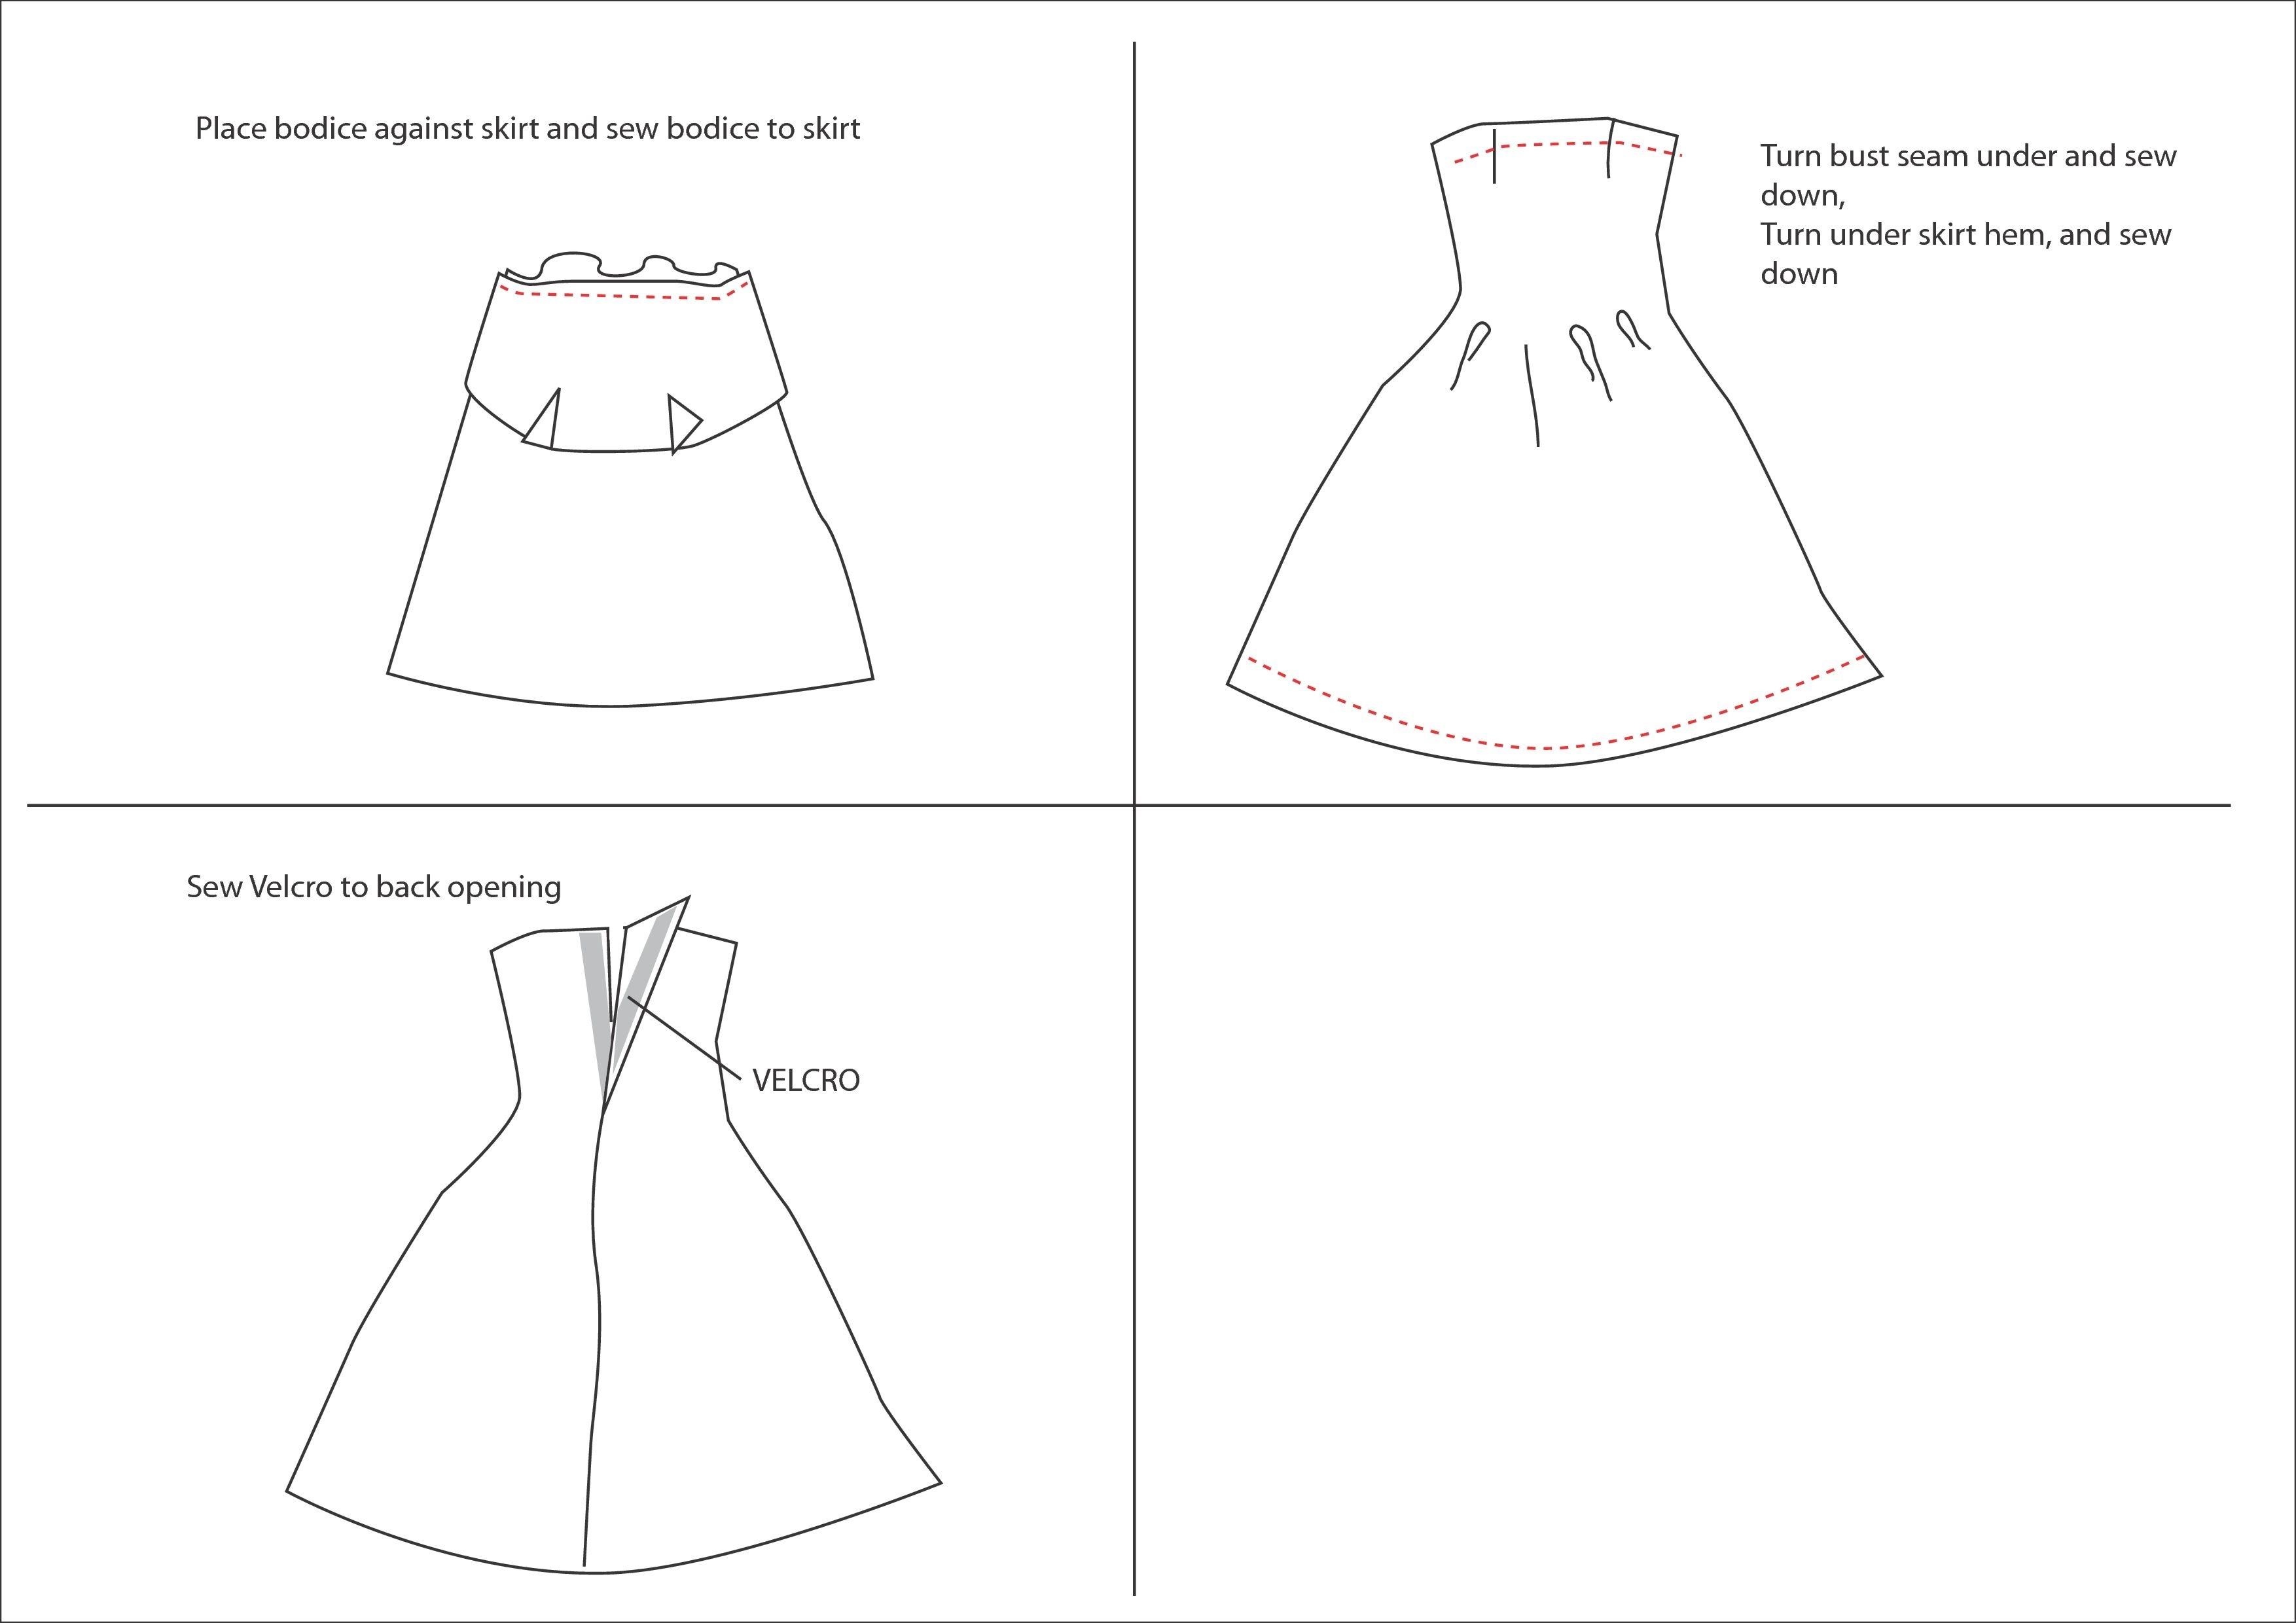 Barbie Dress Patterns Free Printable Pdf - Barbie Dress Patterns Free Printable Pdf